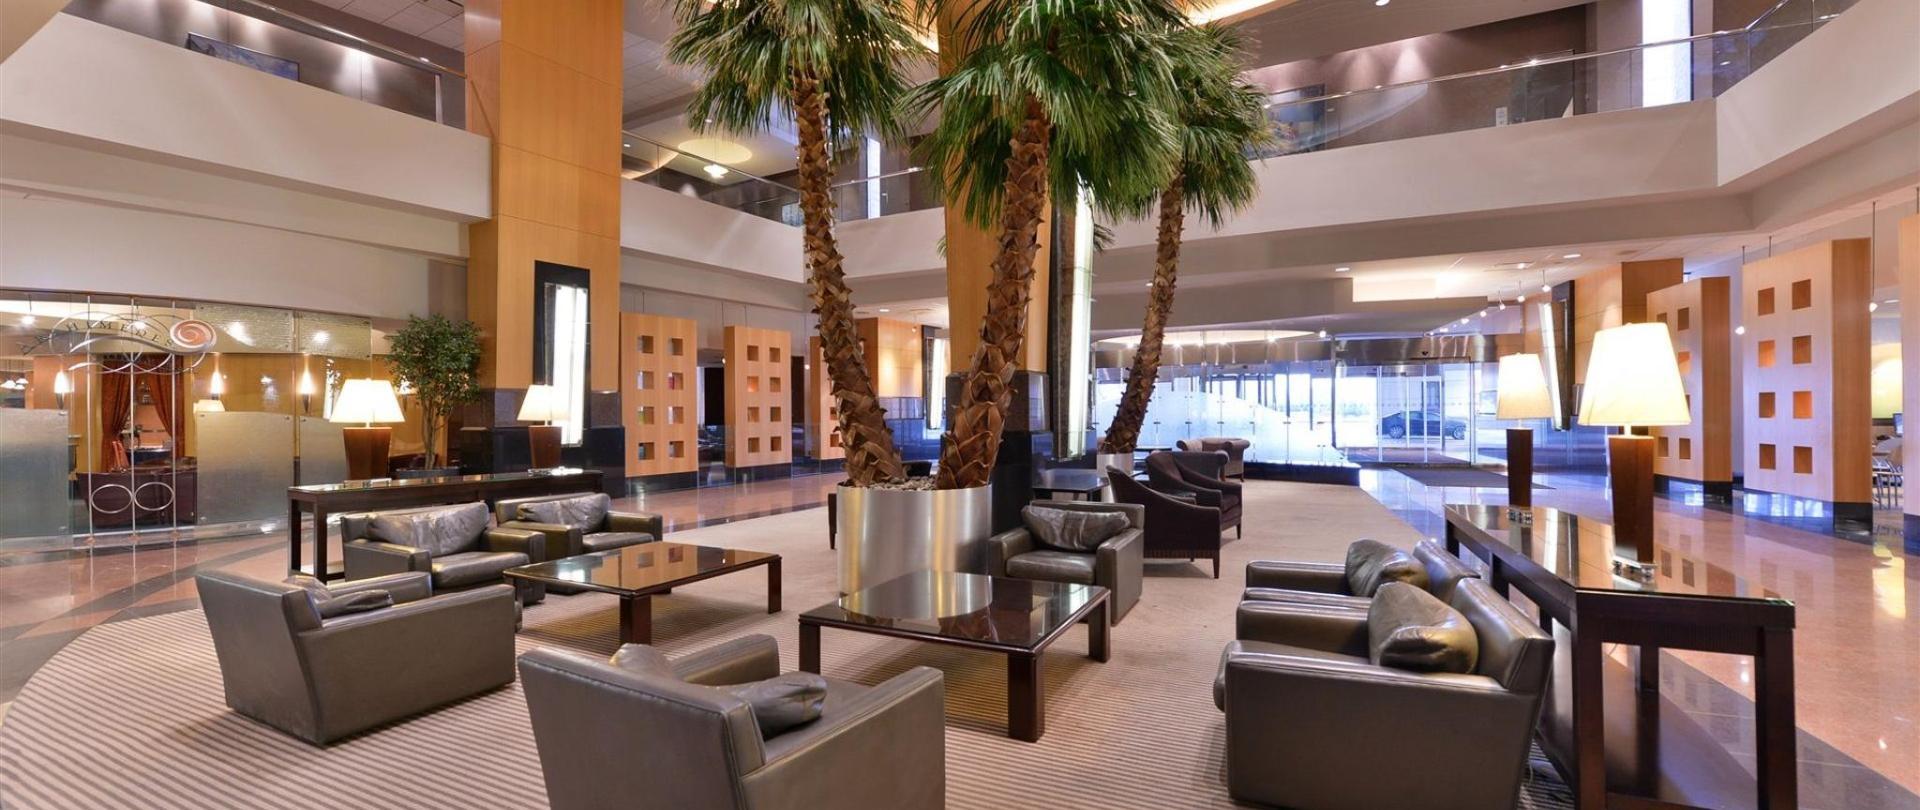 Edward Hotel & Convention Center